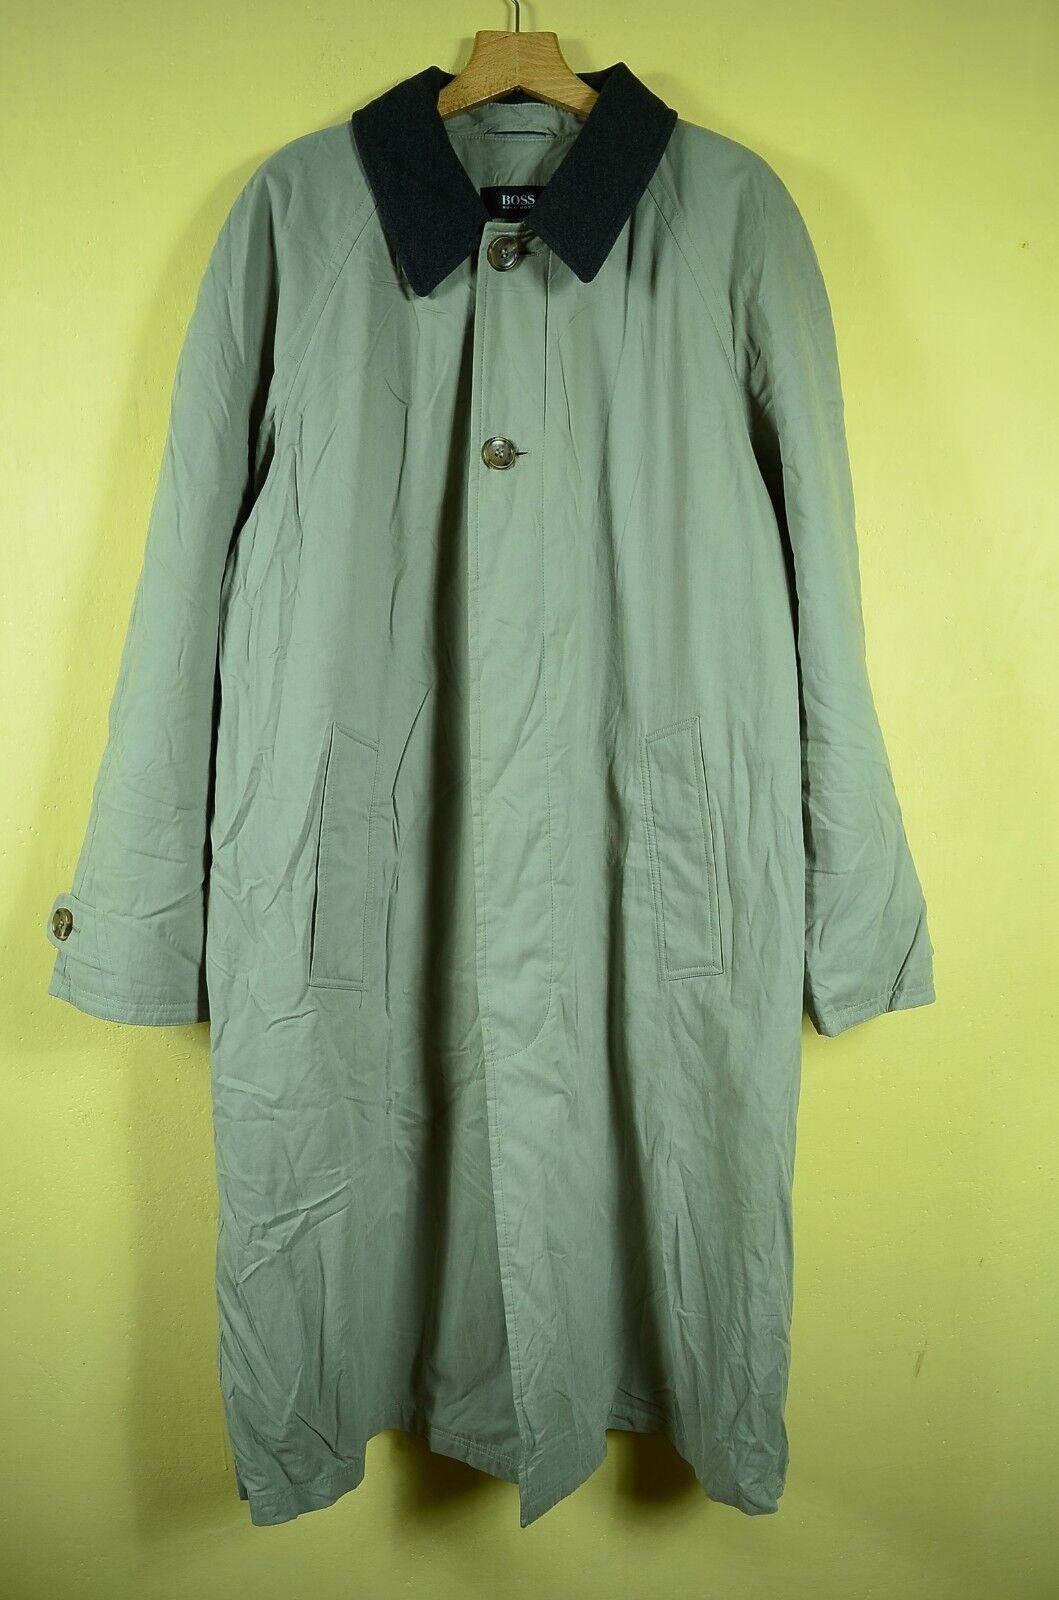 HUGO BOSS _ MEN'S VINTAGE LONG COAT MODEL MIDGET _ size 102 (XL)